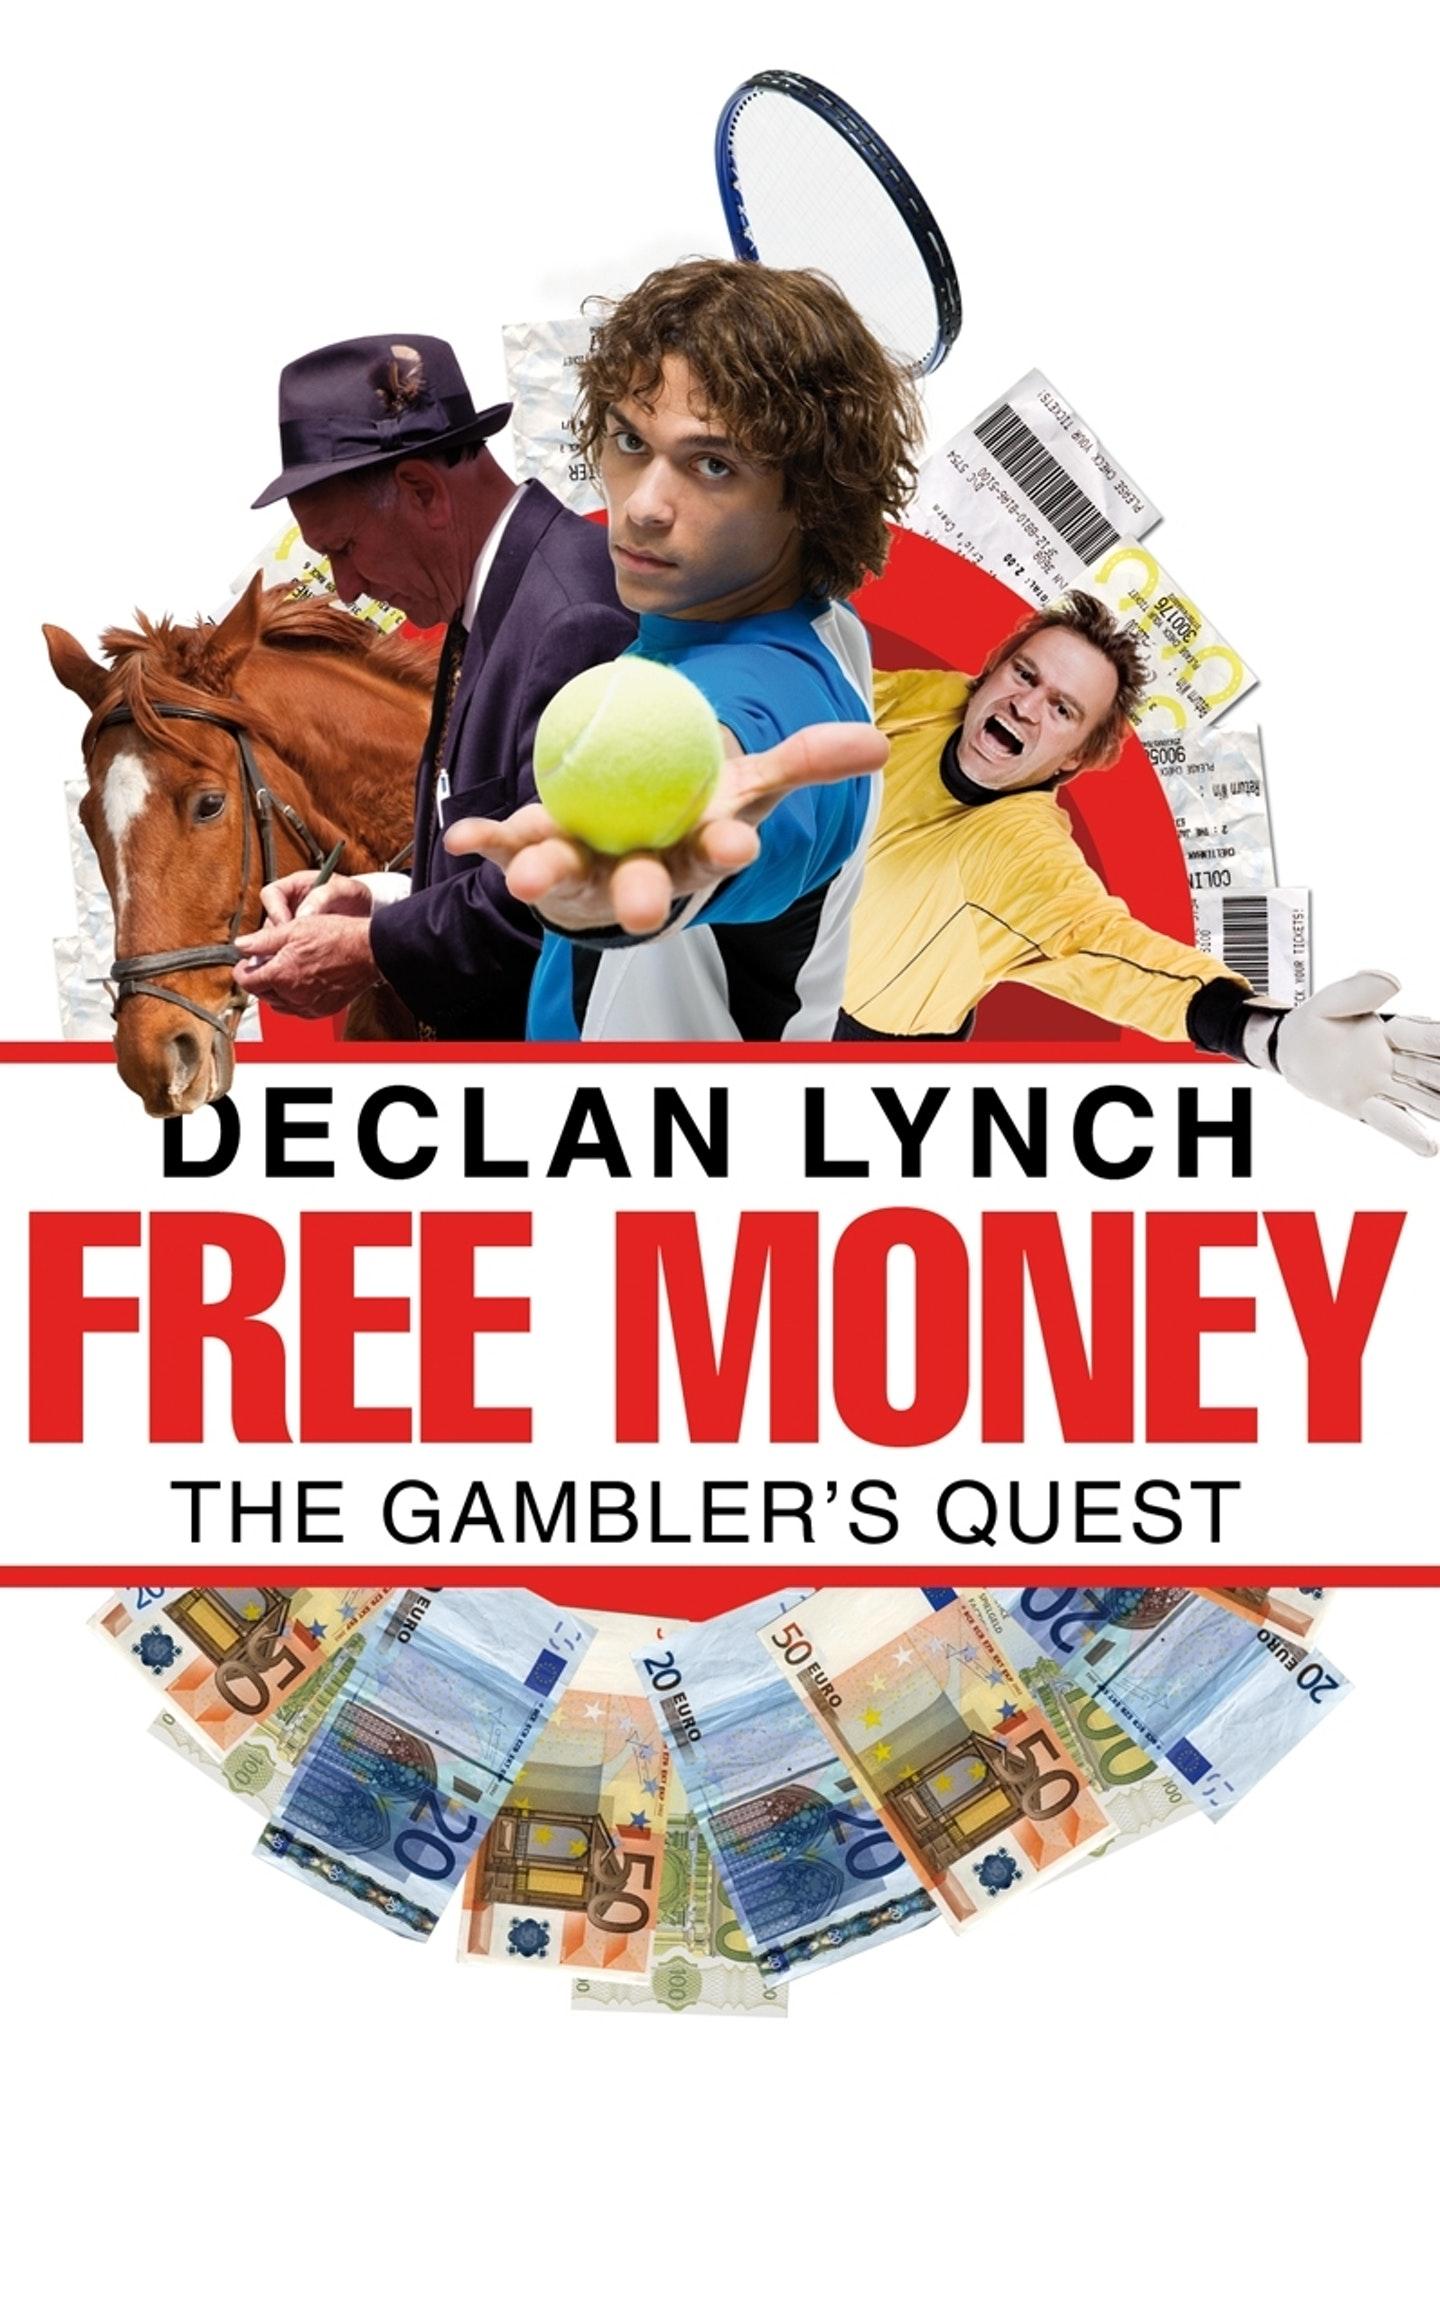 Free gambling books casino palm resort site web